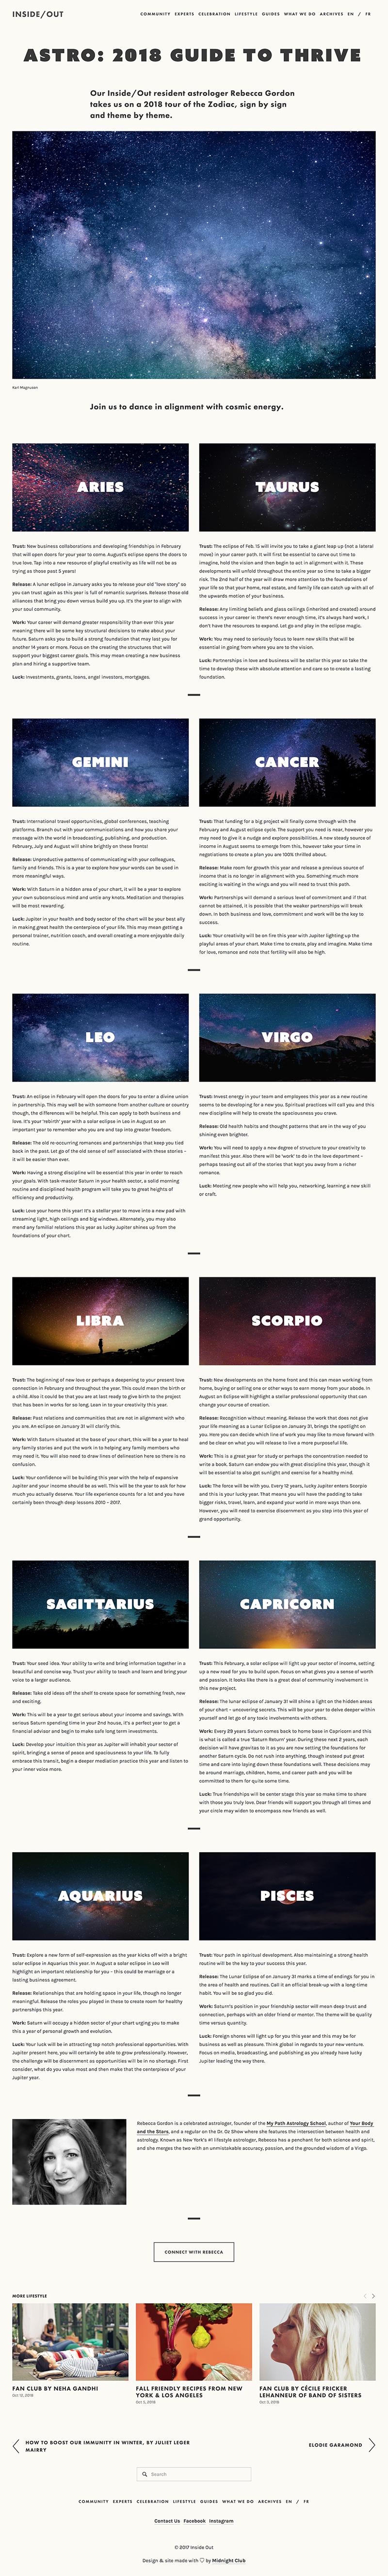 screencapture-insideoutwomen-feed-lifestyle-rebecca-gordon-astro-outlook-2018-2018-10-16-16_10_37.png